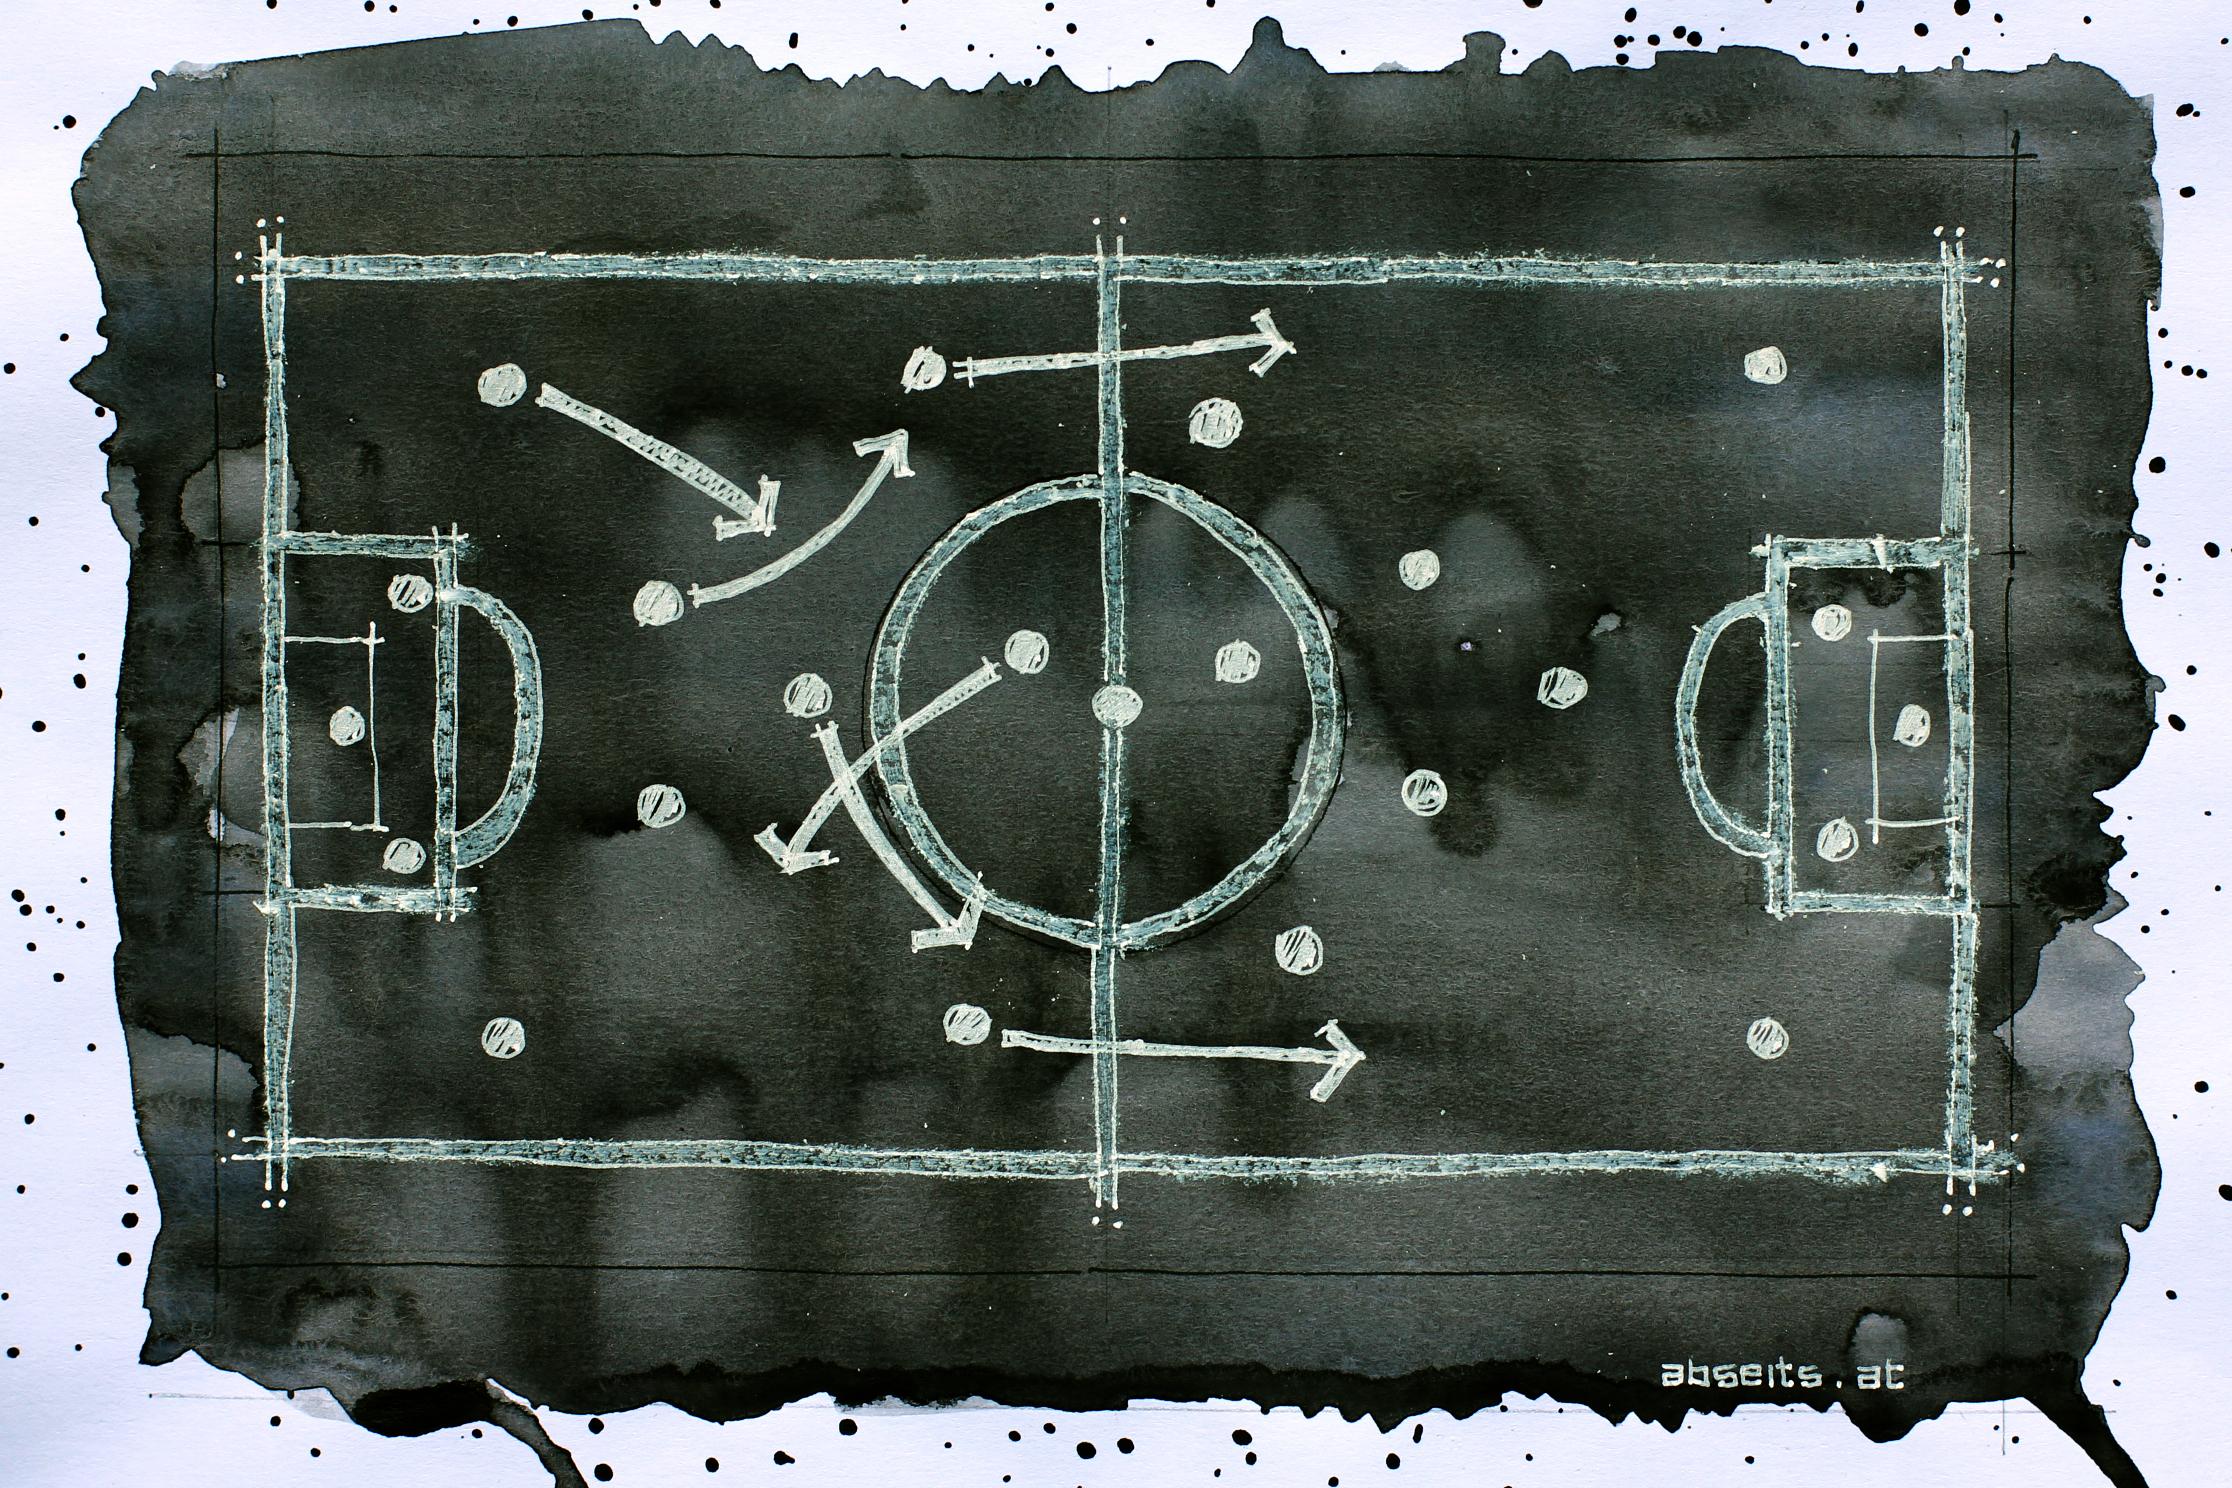 Taktik, Theorie, Taktikboard